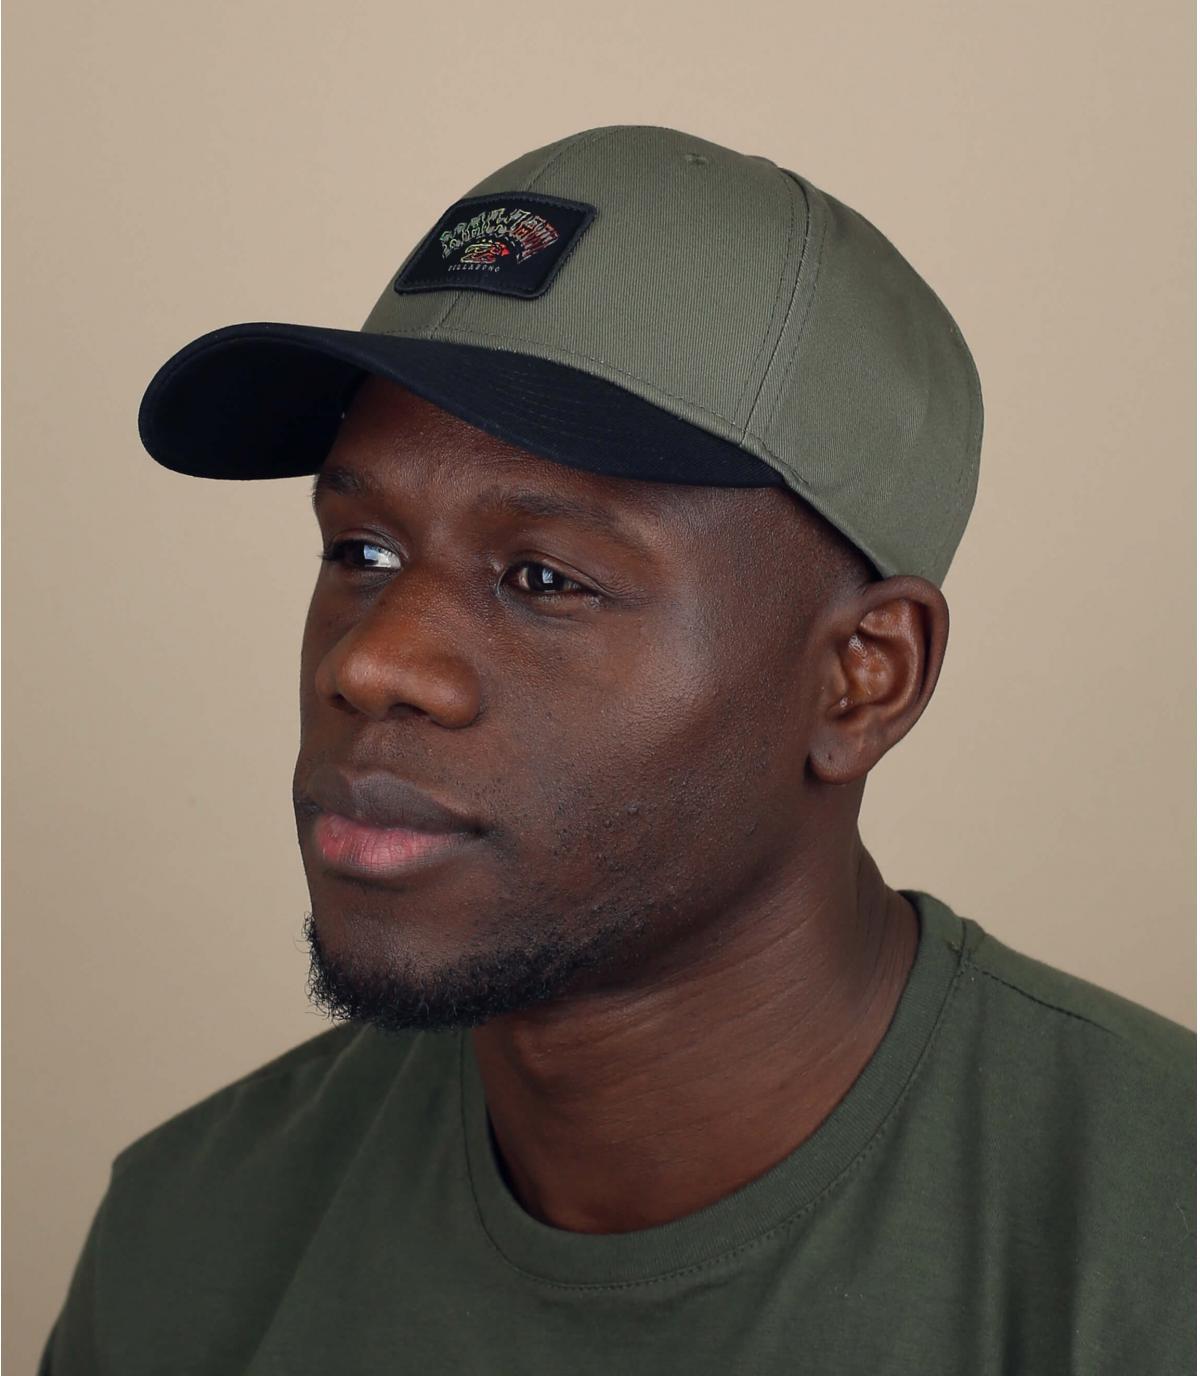 cappellino Billabong verde